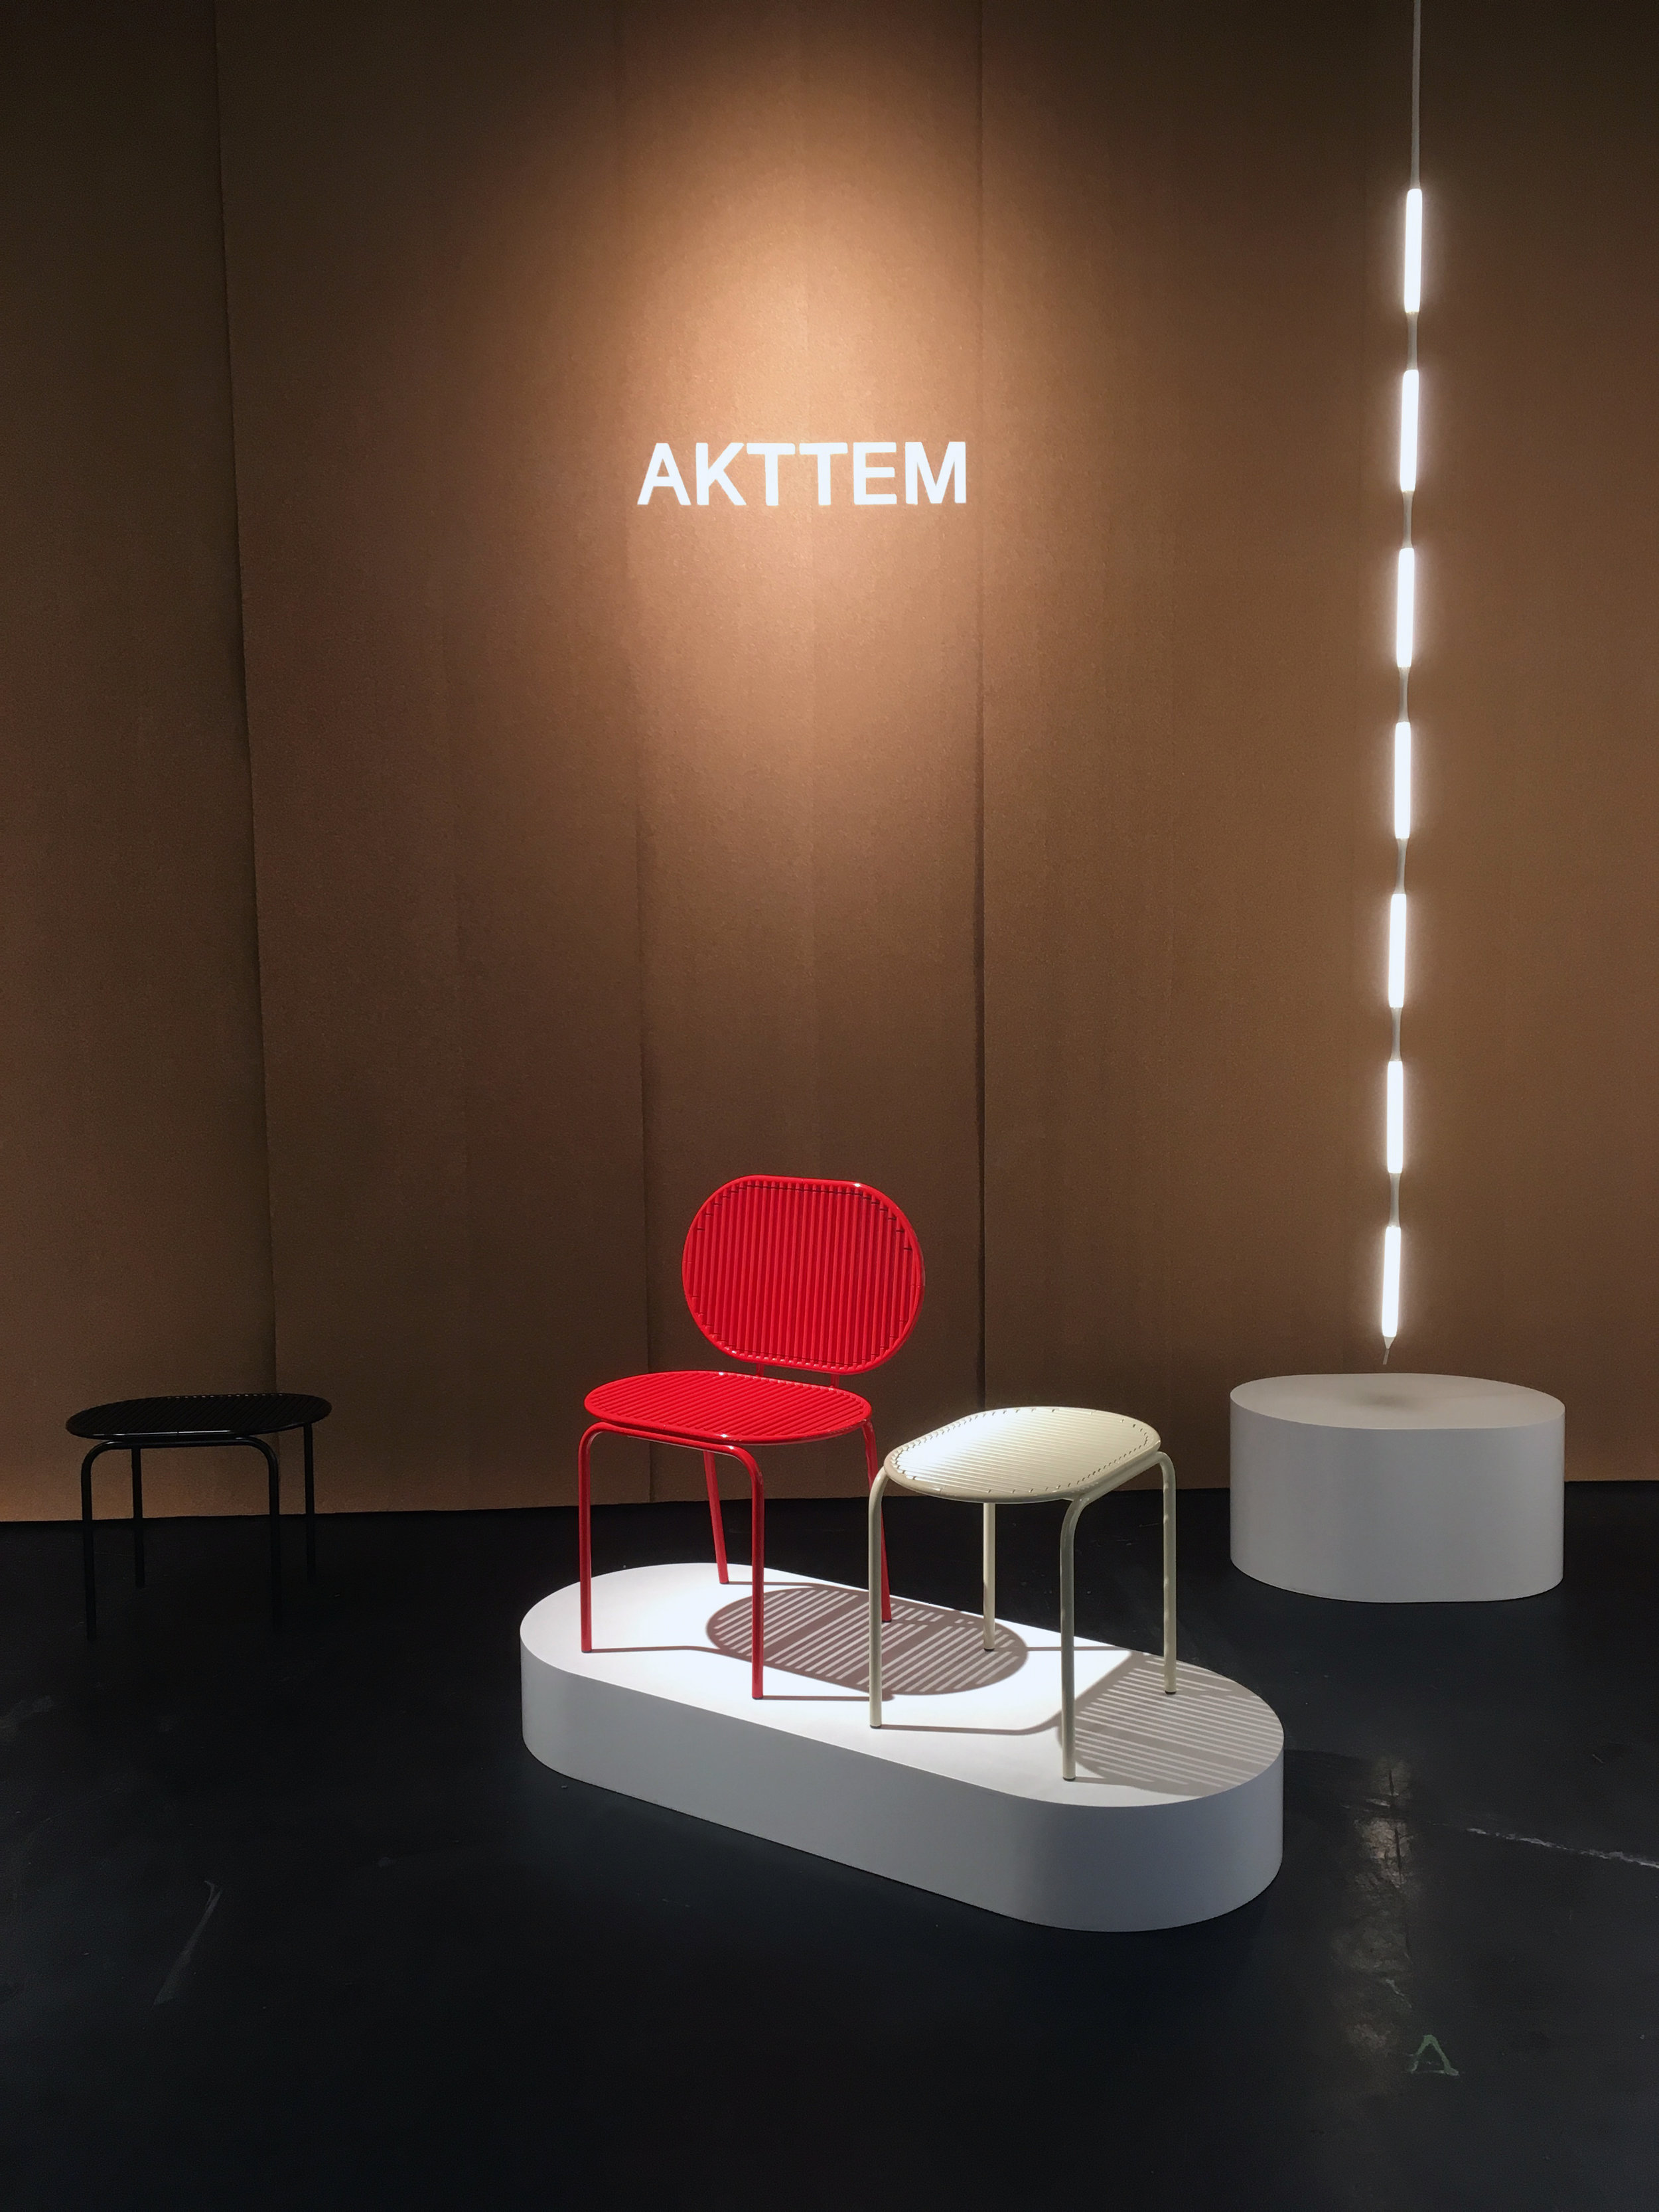 Verena-Hennig-AKTTEM-Koeln-2018-06.jpg